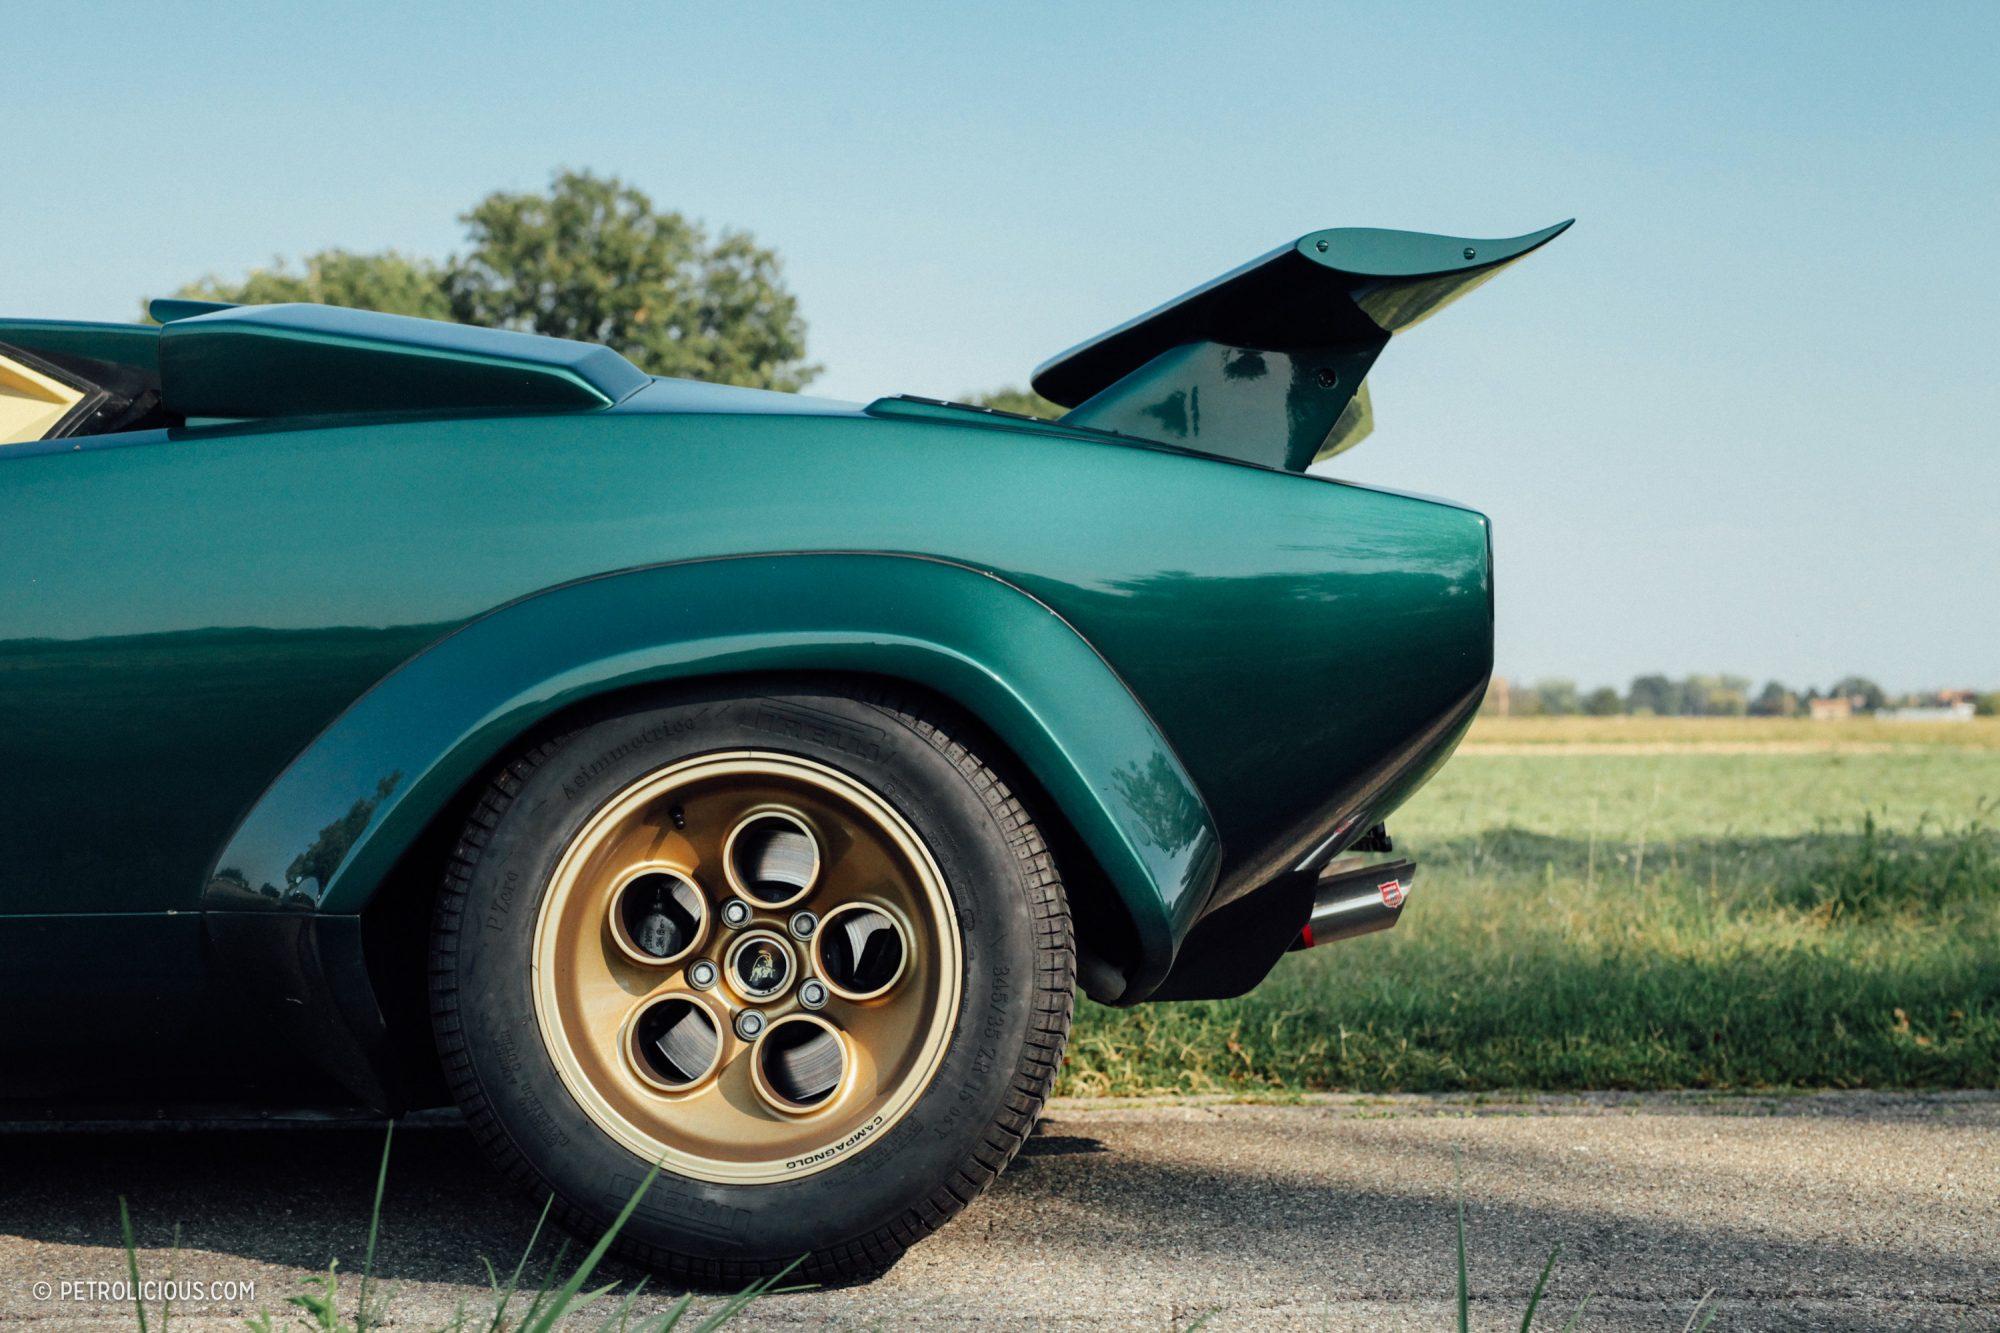 Marco-Annunziata-Lamborghini-Countach-LP400S-Verde-Pino-26-2000x1333